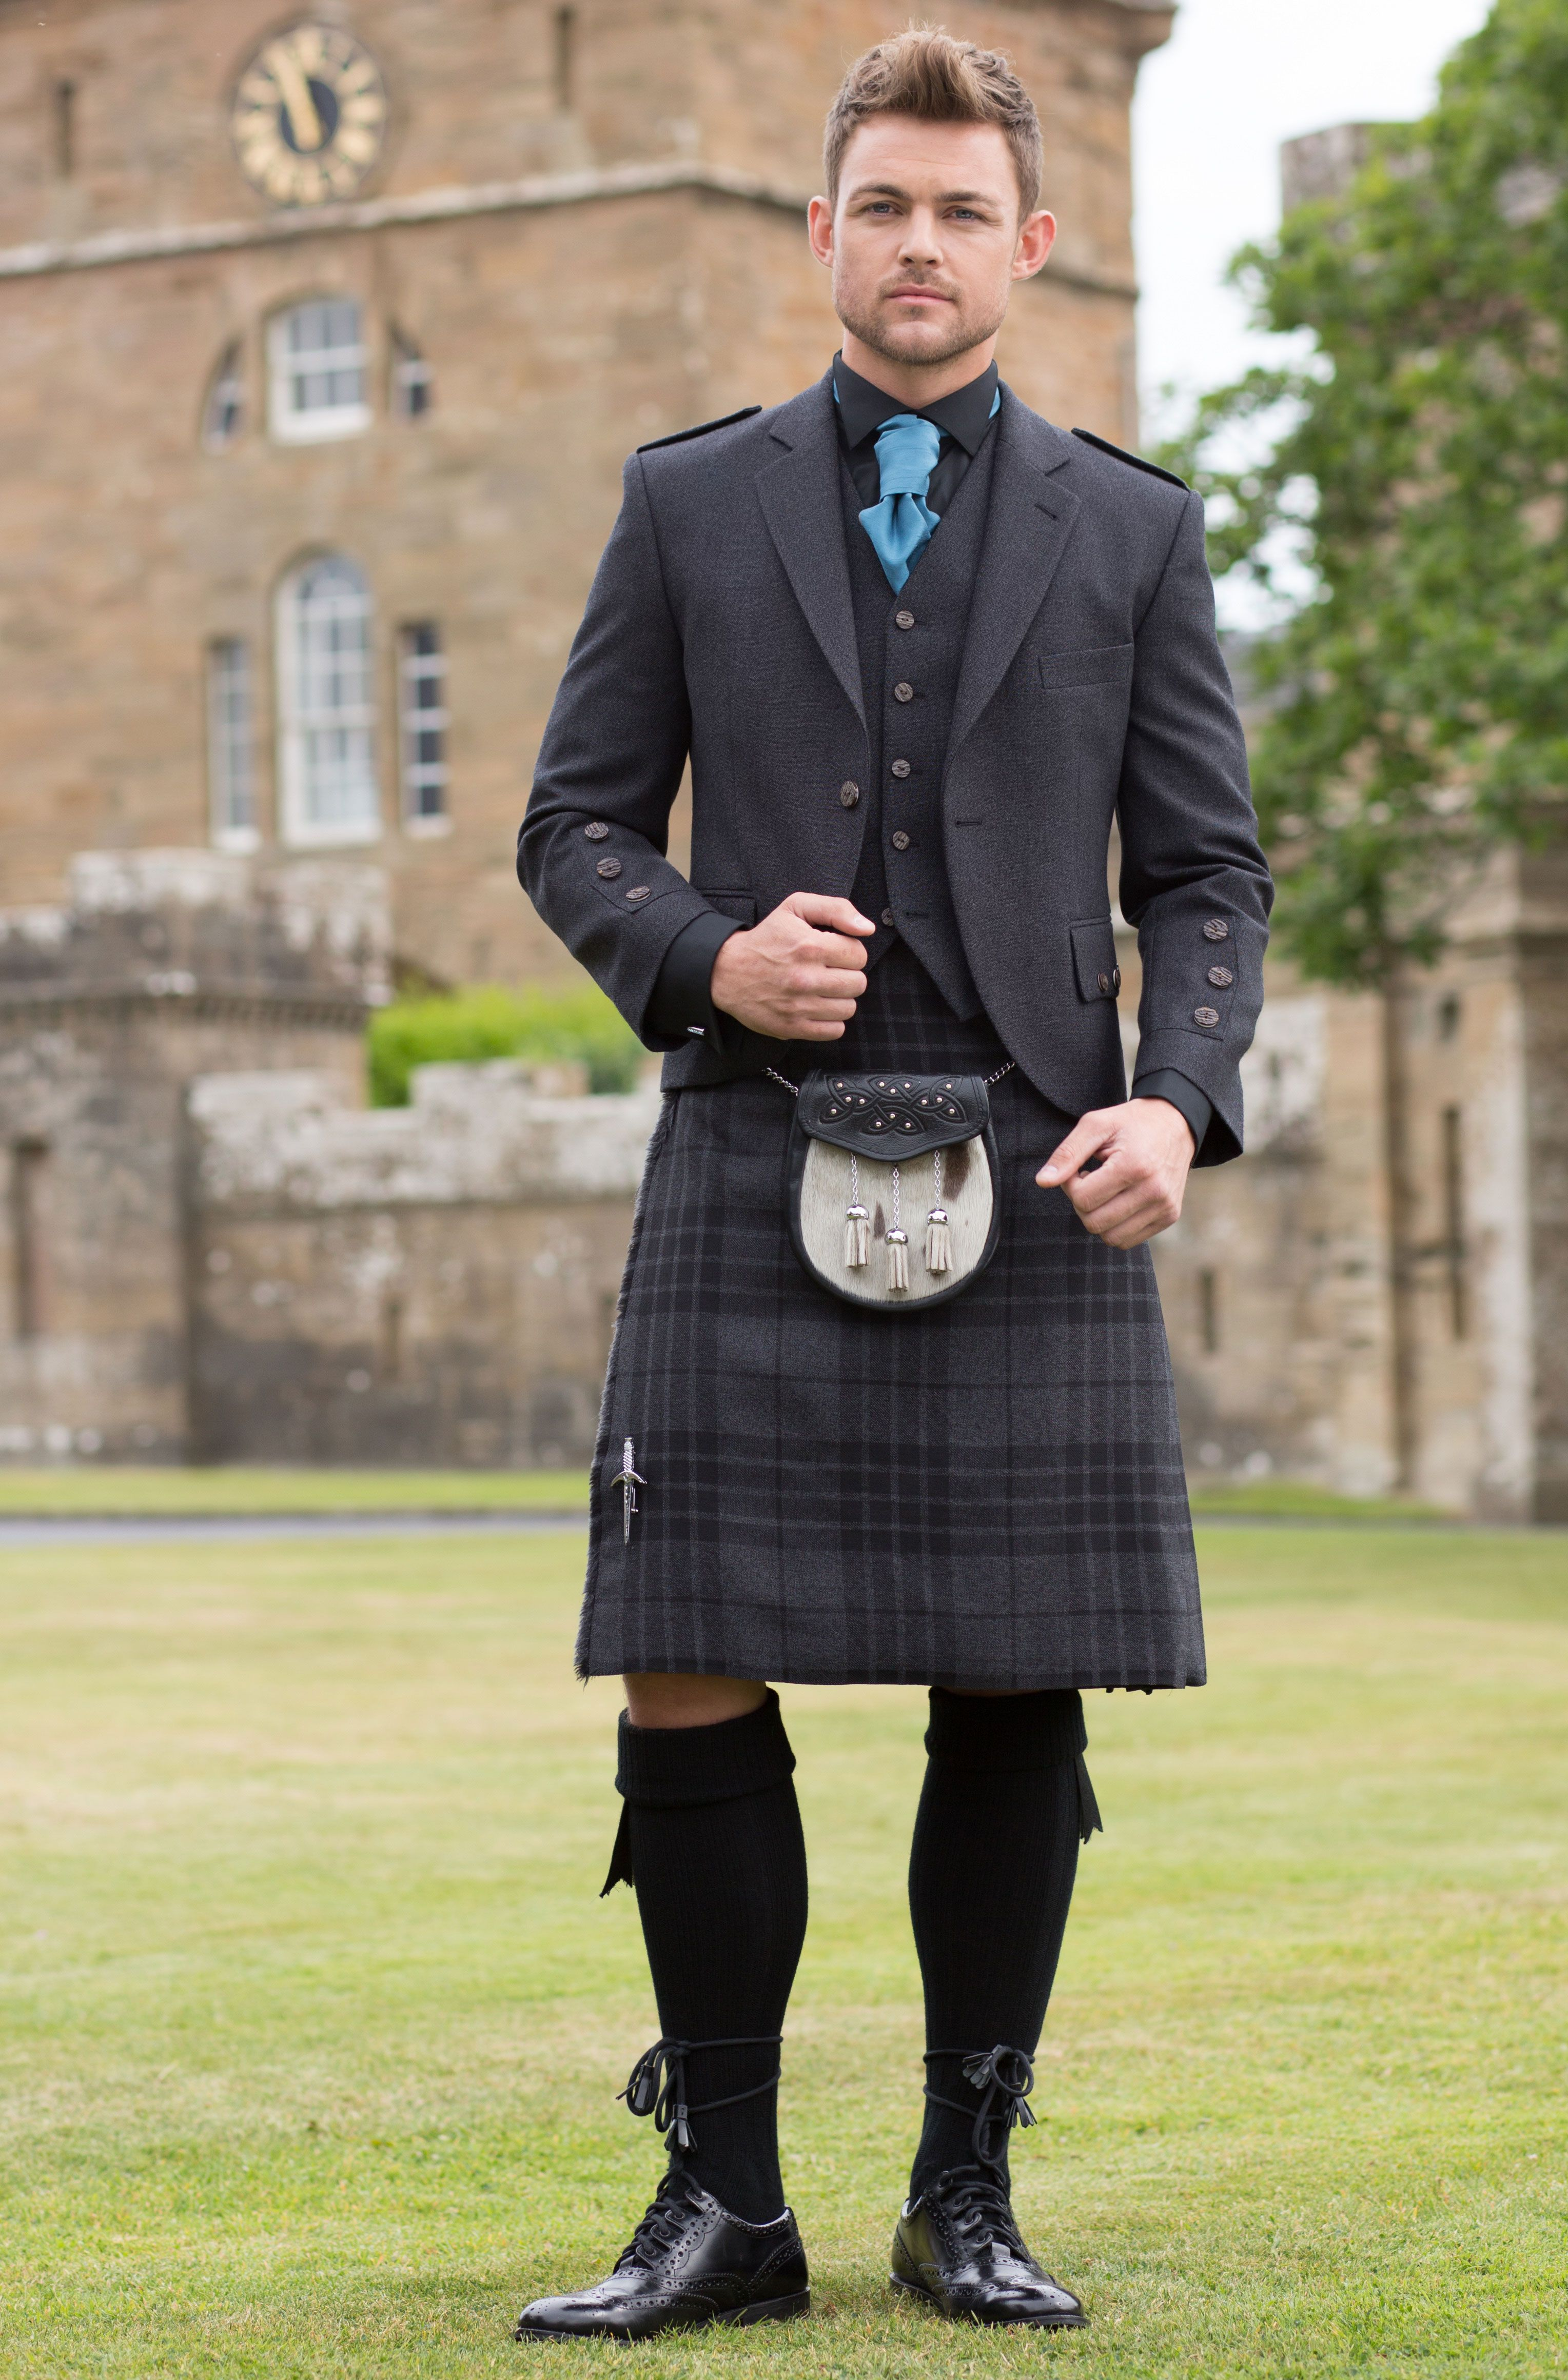 Kilts Dinner Suits Tailcoats And Suit Hire Slater Menswear Men In Kilts Kilt Outfits Kilt